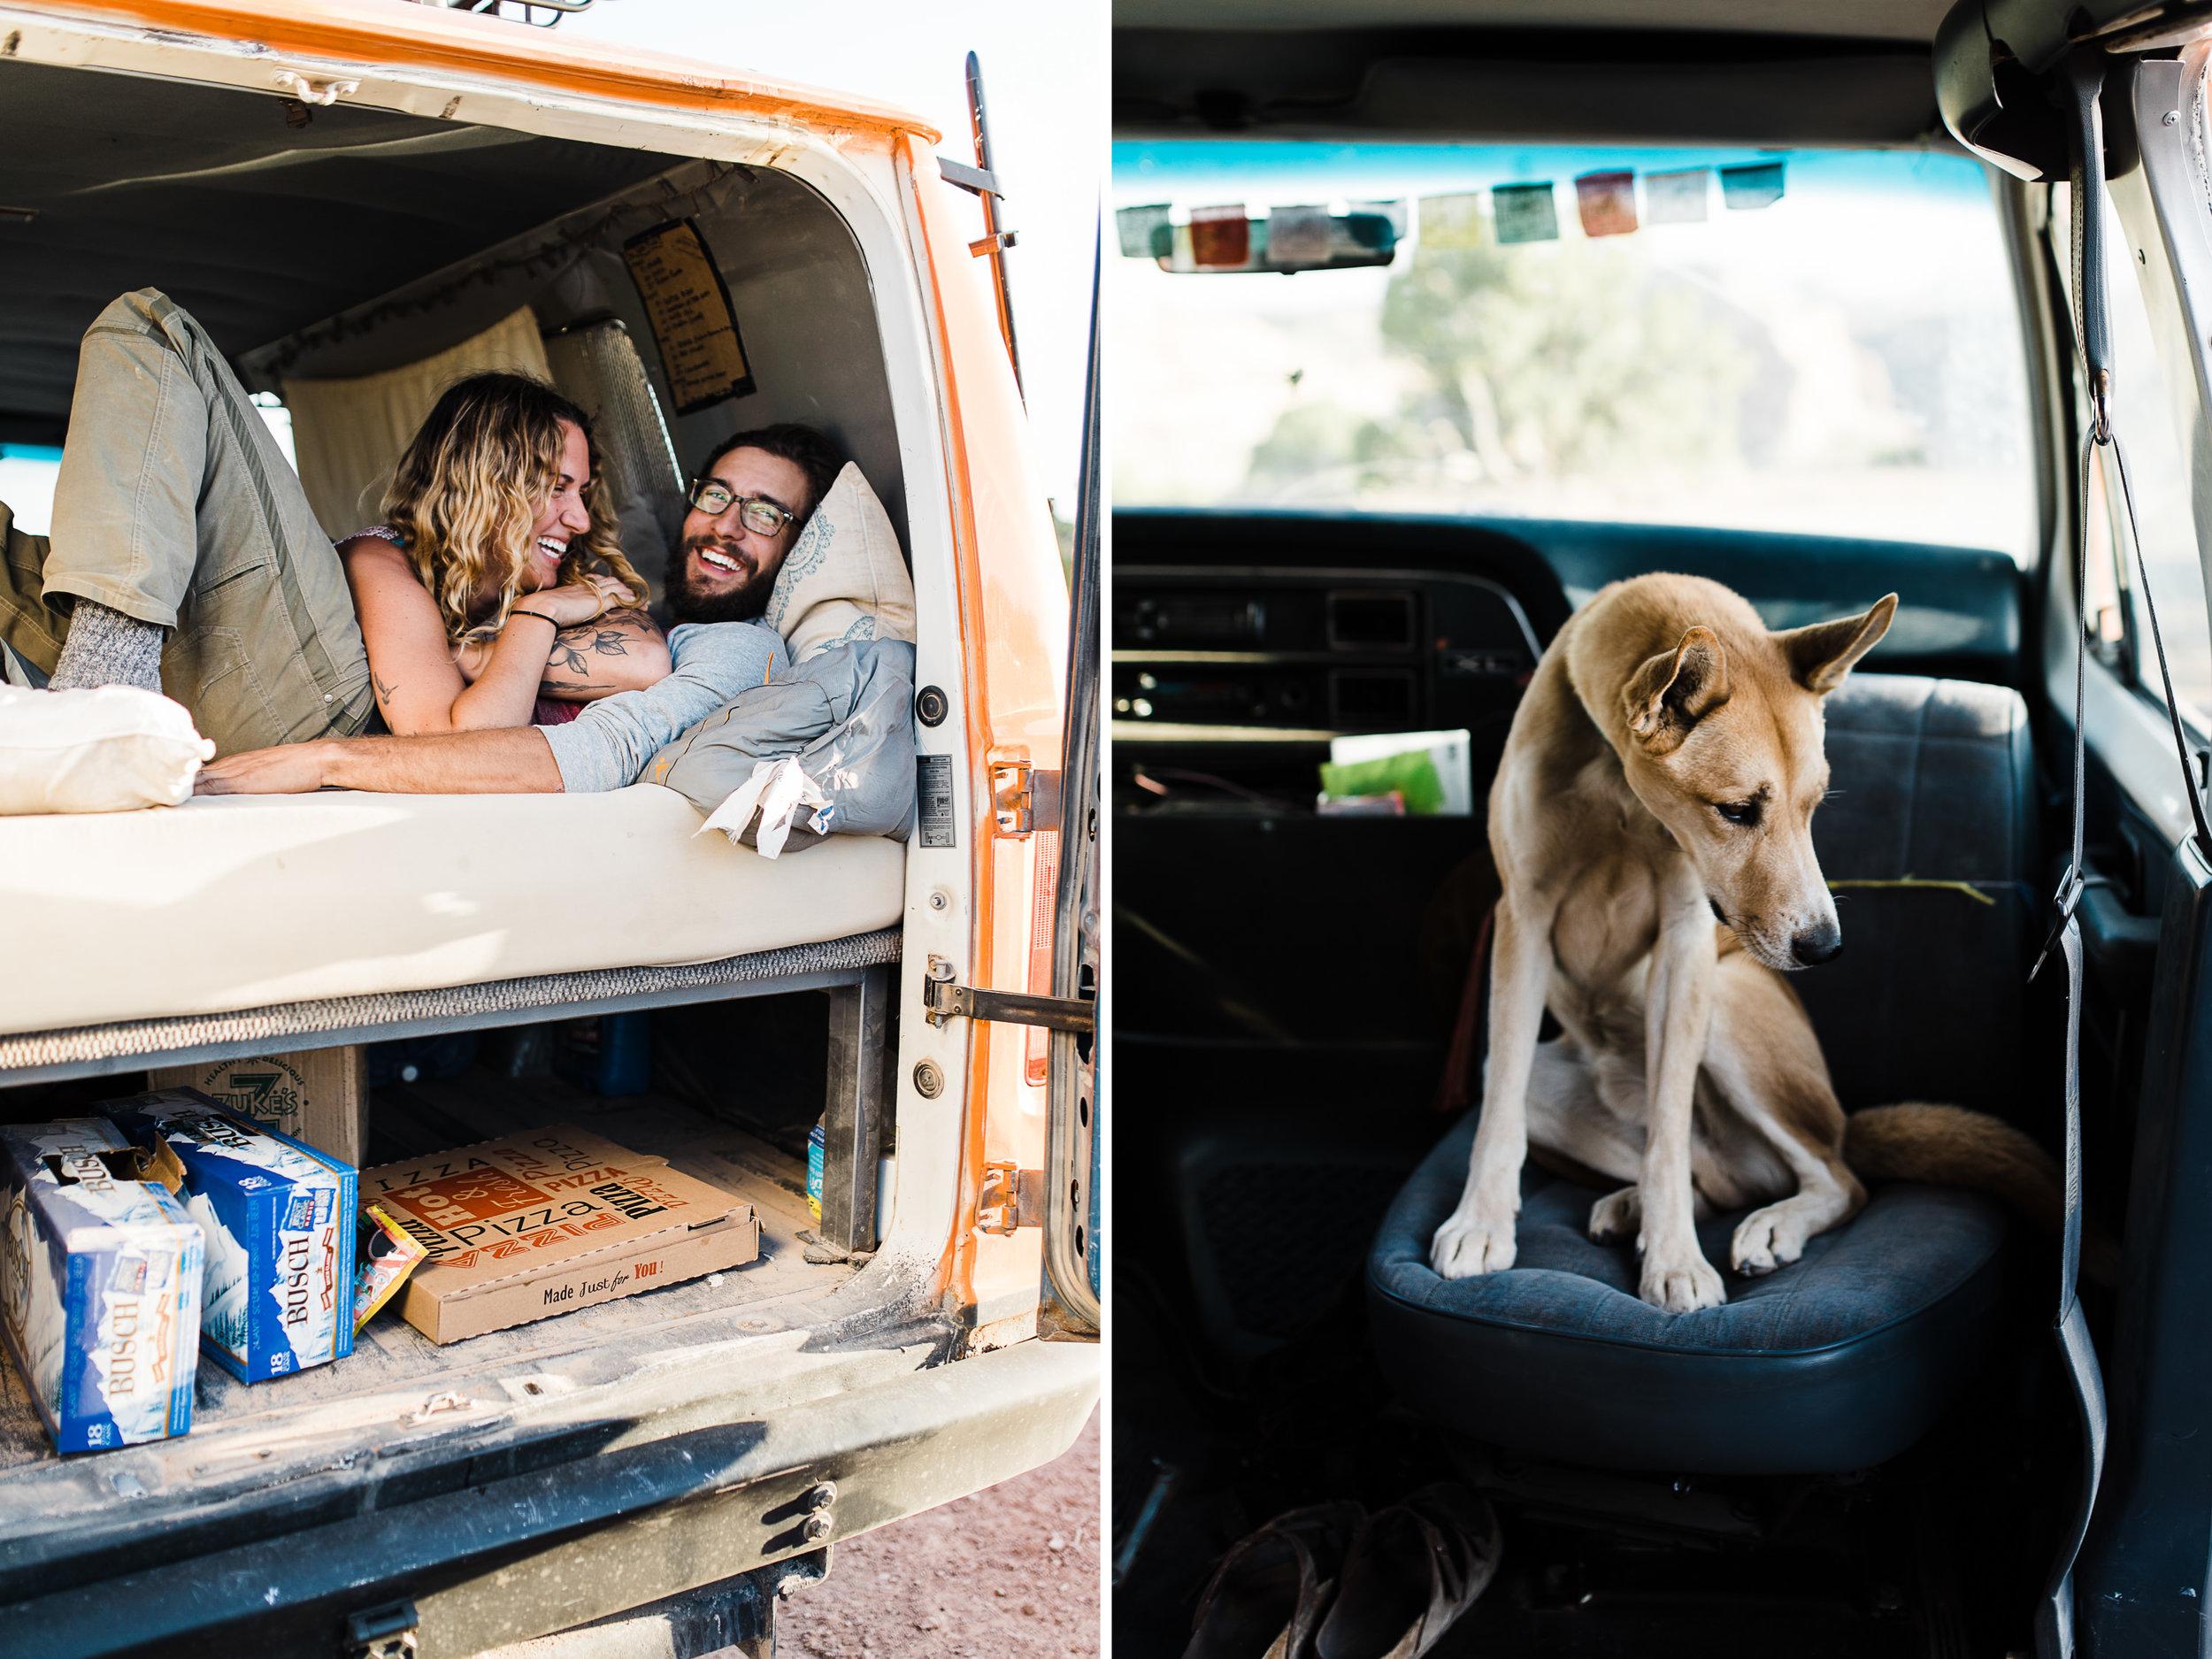 adventure van life session in utah n| destination engagement photo inspiration | utah adventure elopement photographers | the hearnes adventure photography | www.thehearnes.com